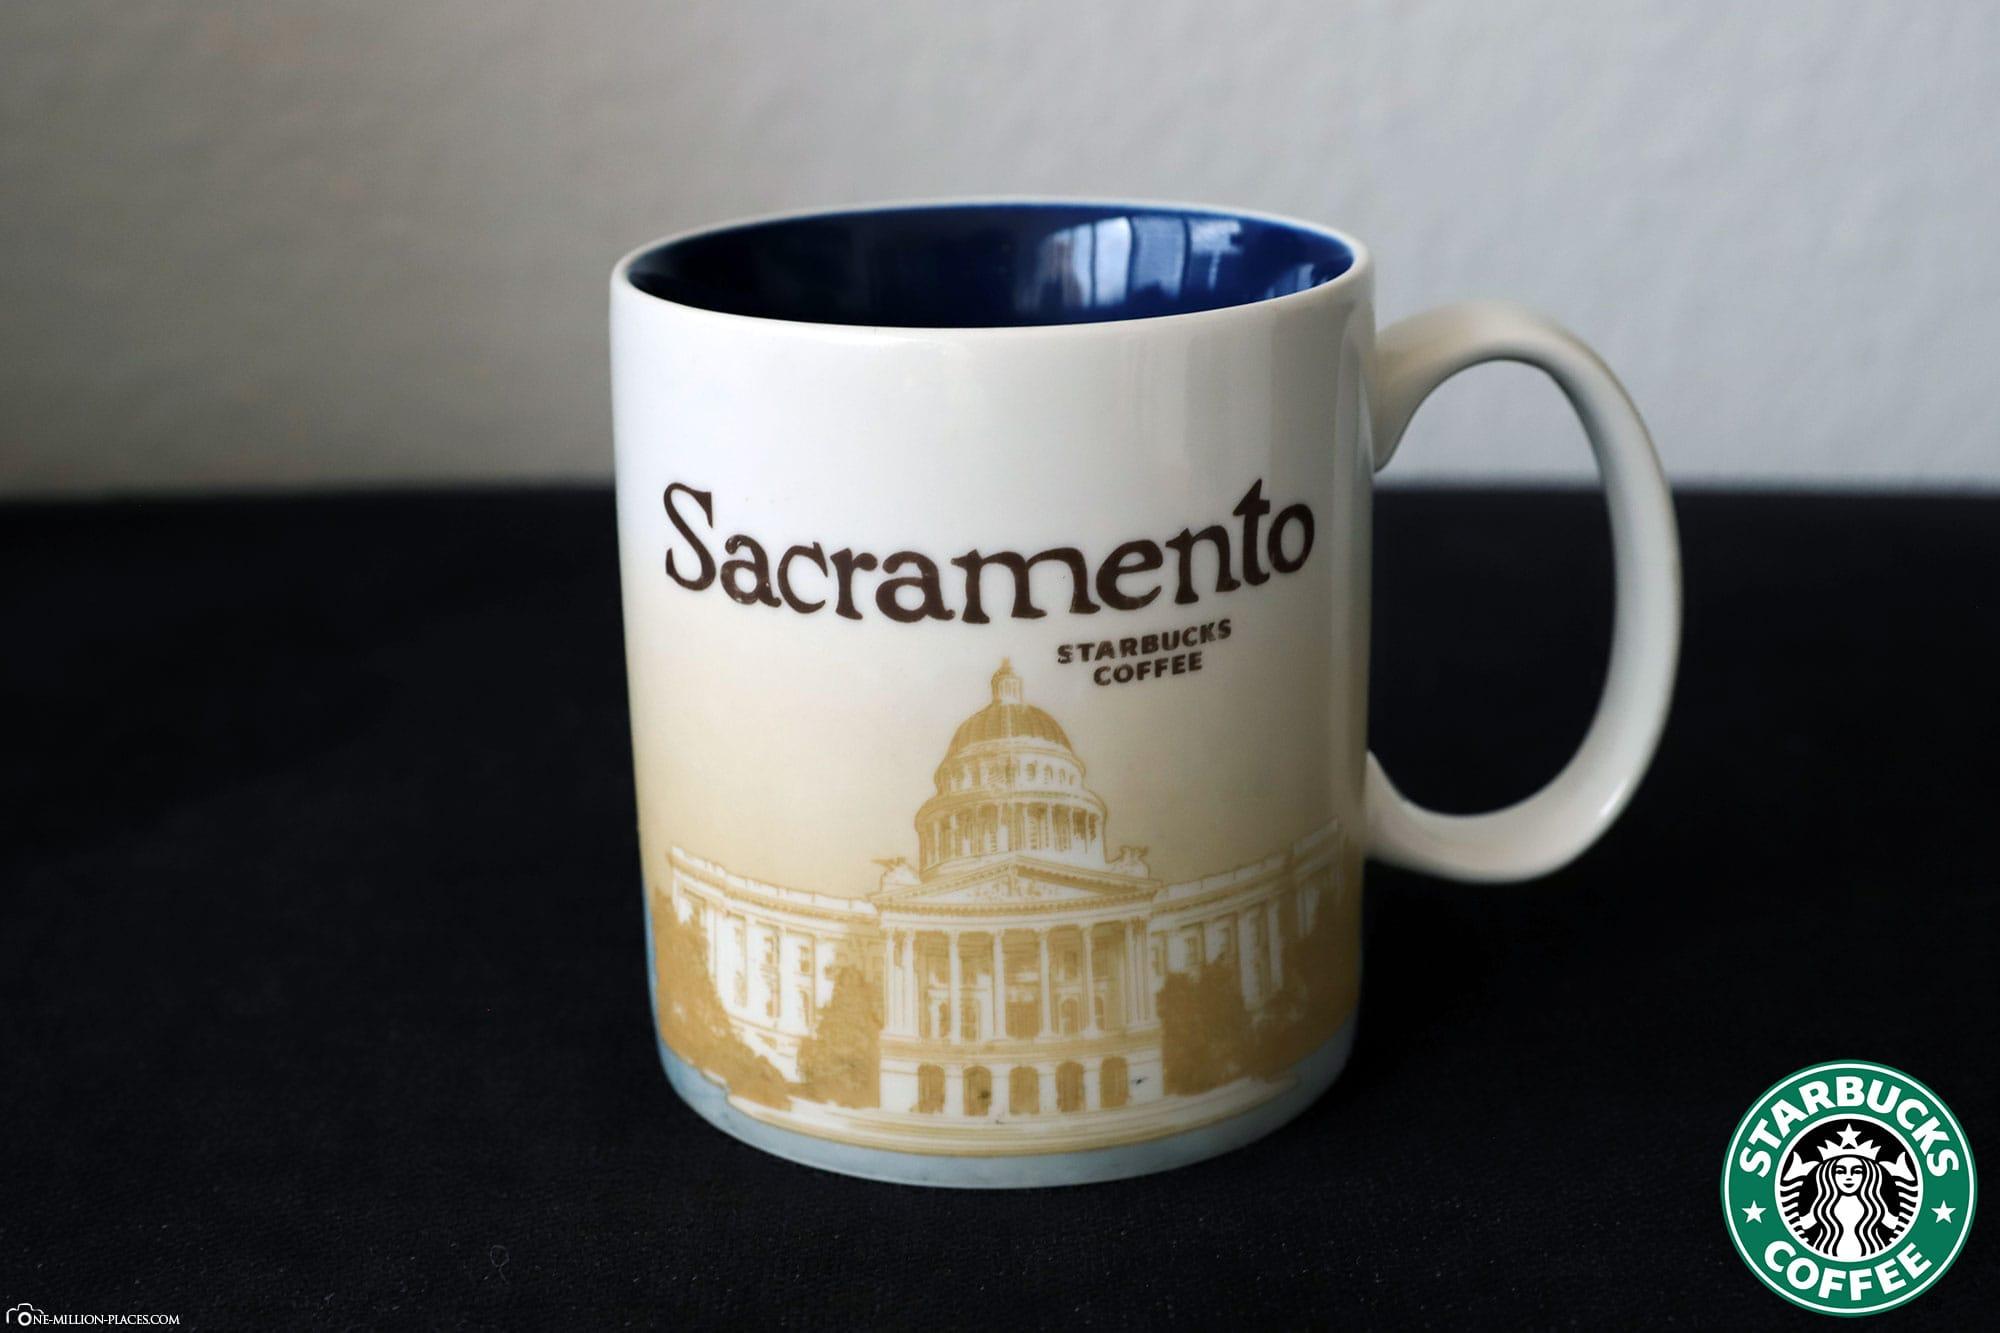 Sacramento, Starbucks Cup, Global Icon Series, City Mugs, Collection, USA, Travelreport